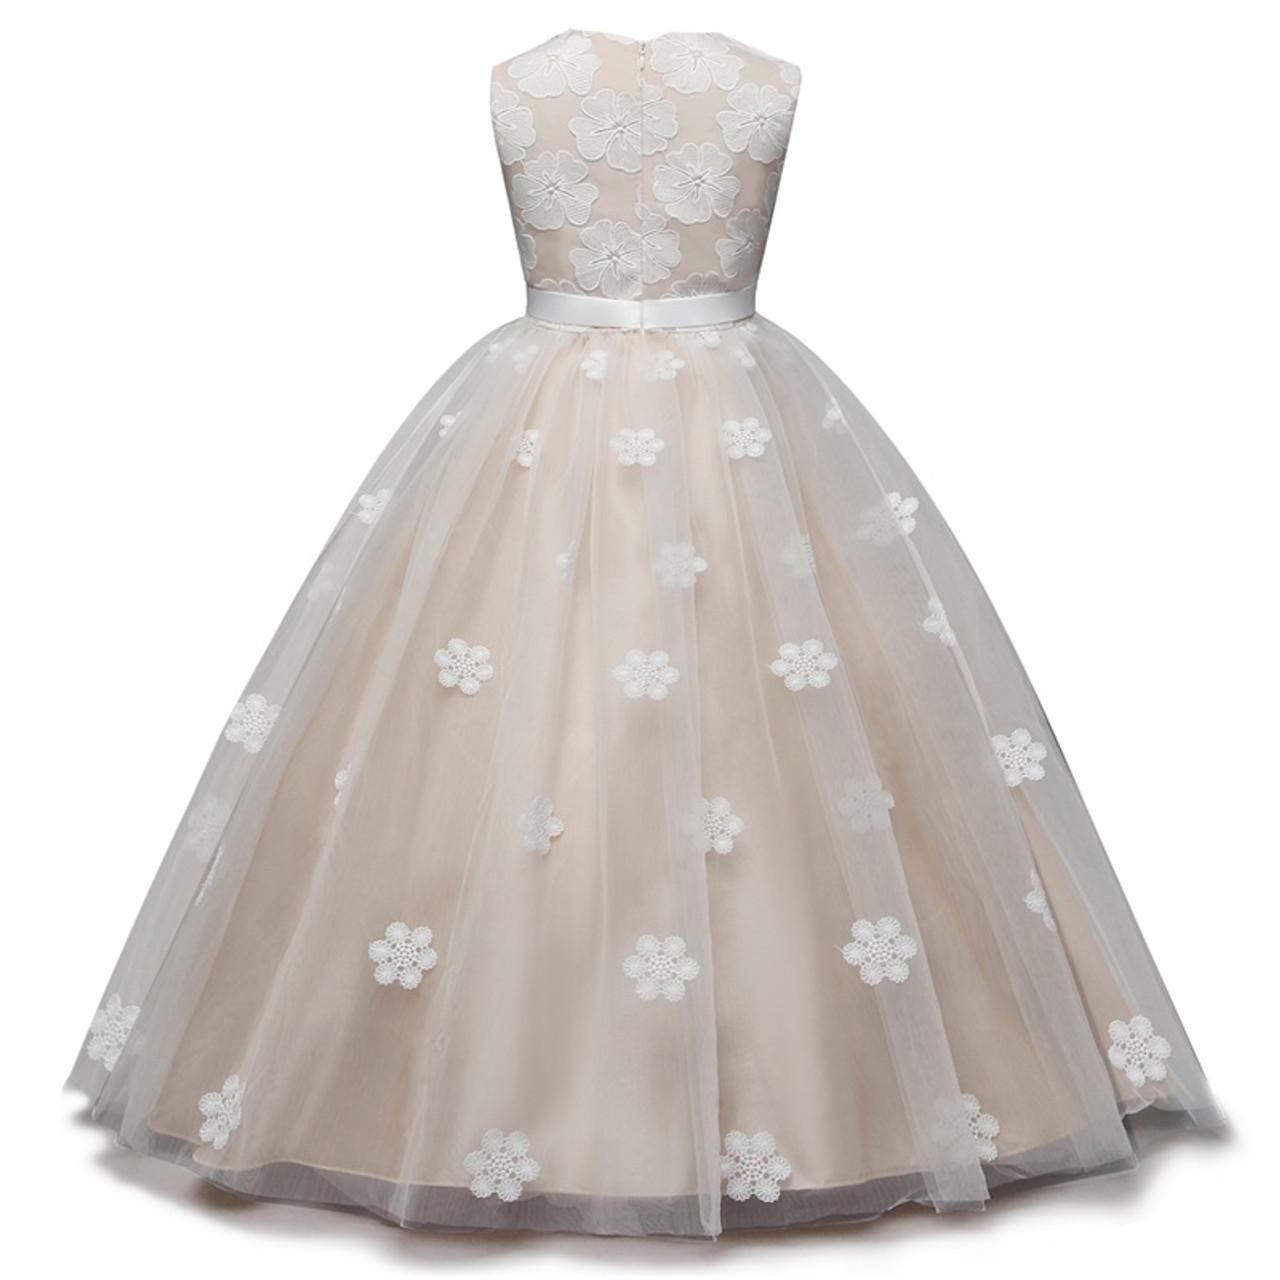 f03ea3557f521 Flower Girl Dress Children Graduation Gowns Ceremony Long Dresses Junior  Summer Party Clothing Kids Birthday Wedding Frock 6-14T